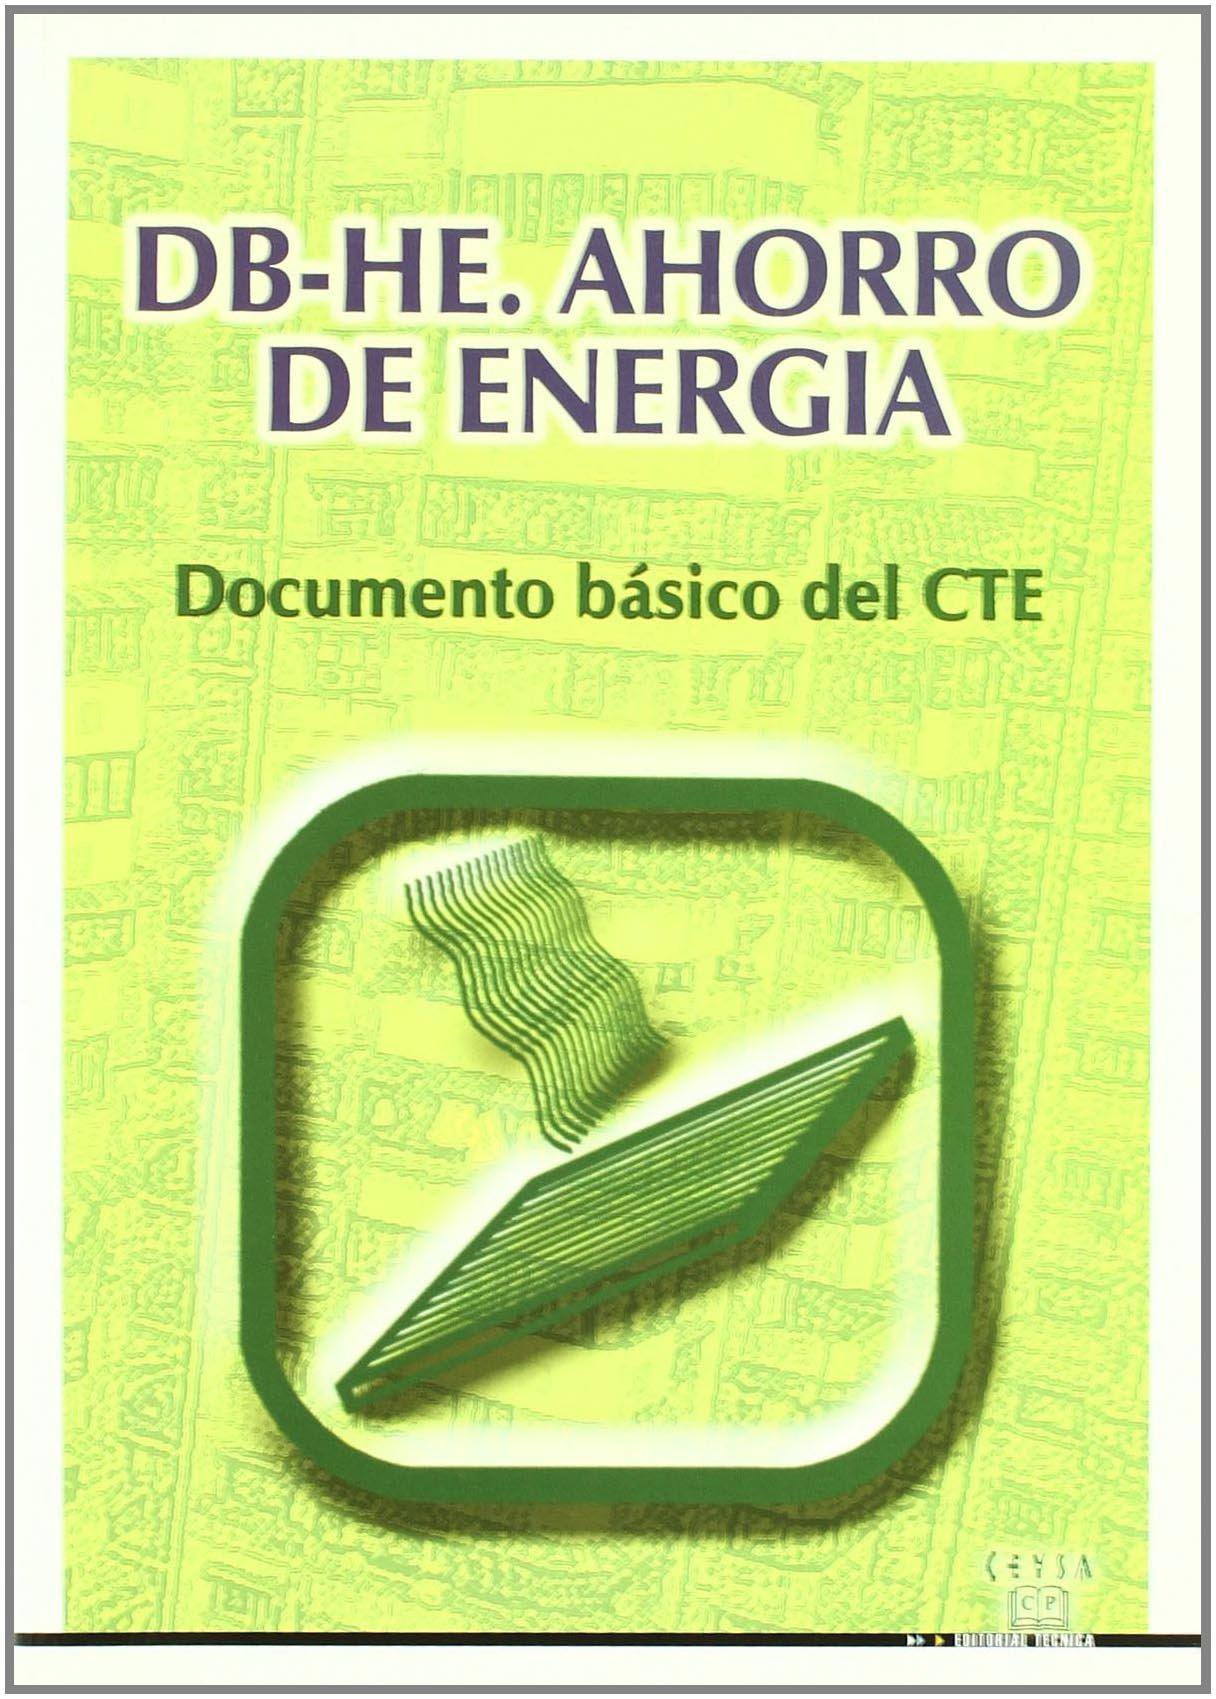 Db-he - ahorro de energia